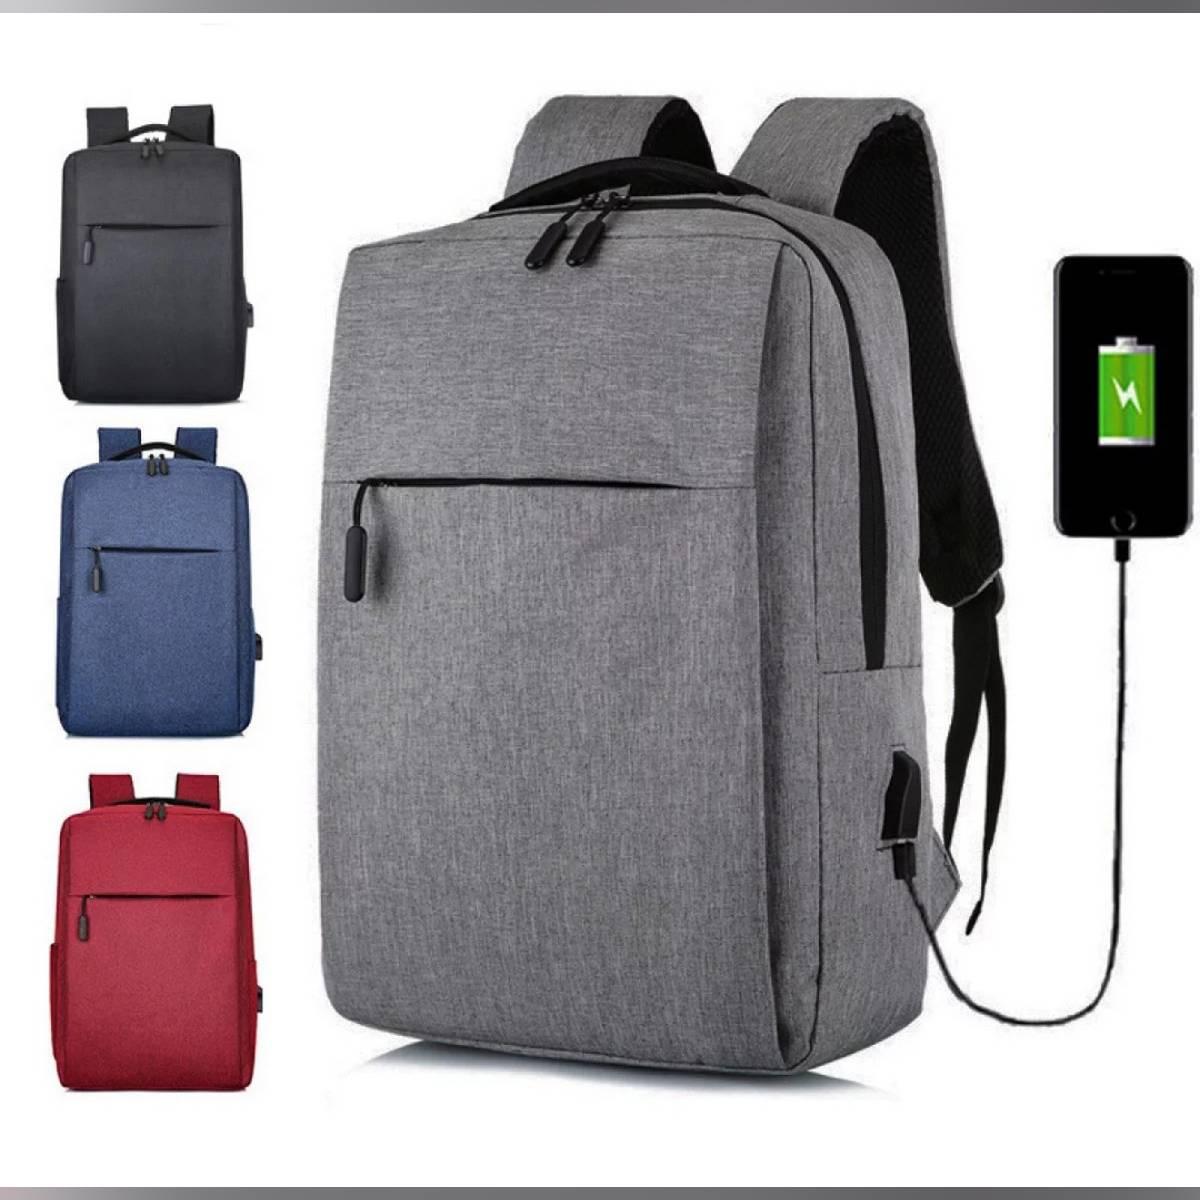 Business Laptop Backpack With USB Universal Charging Port, Travel Backpack, College Bag, University Backpack, Office backpack